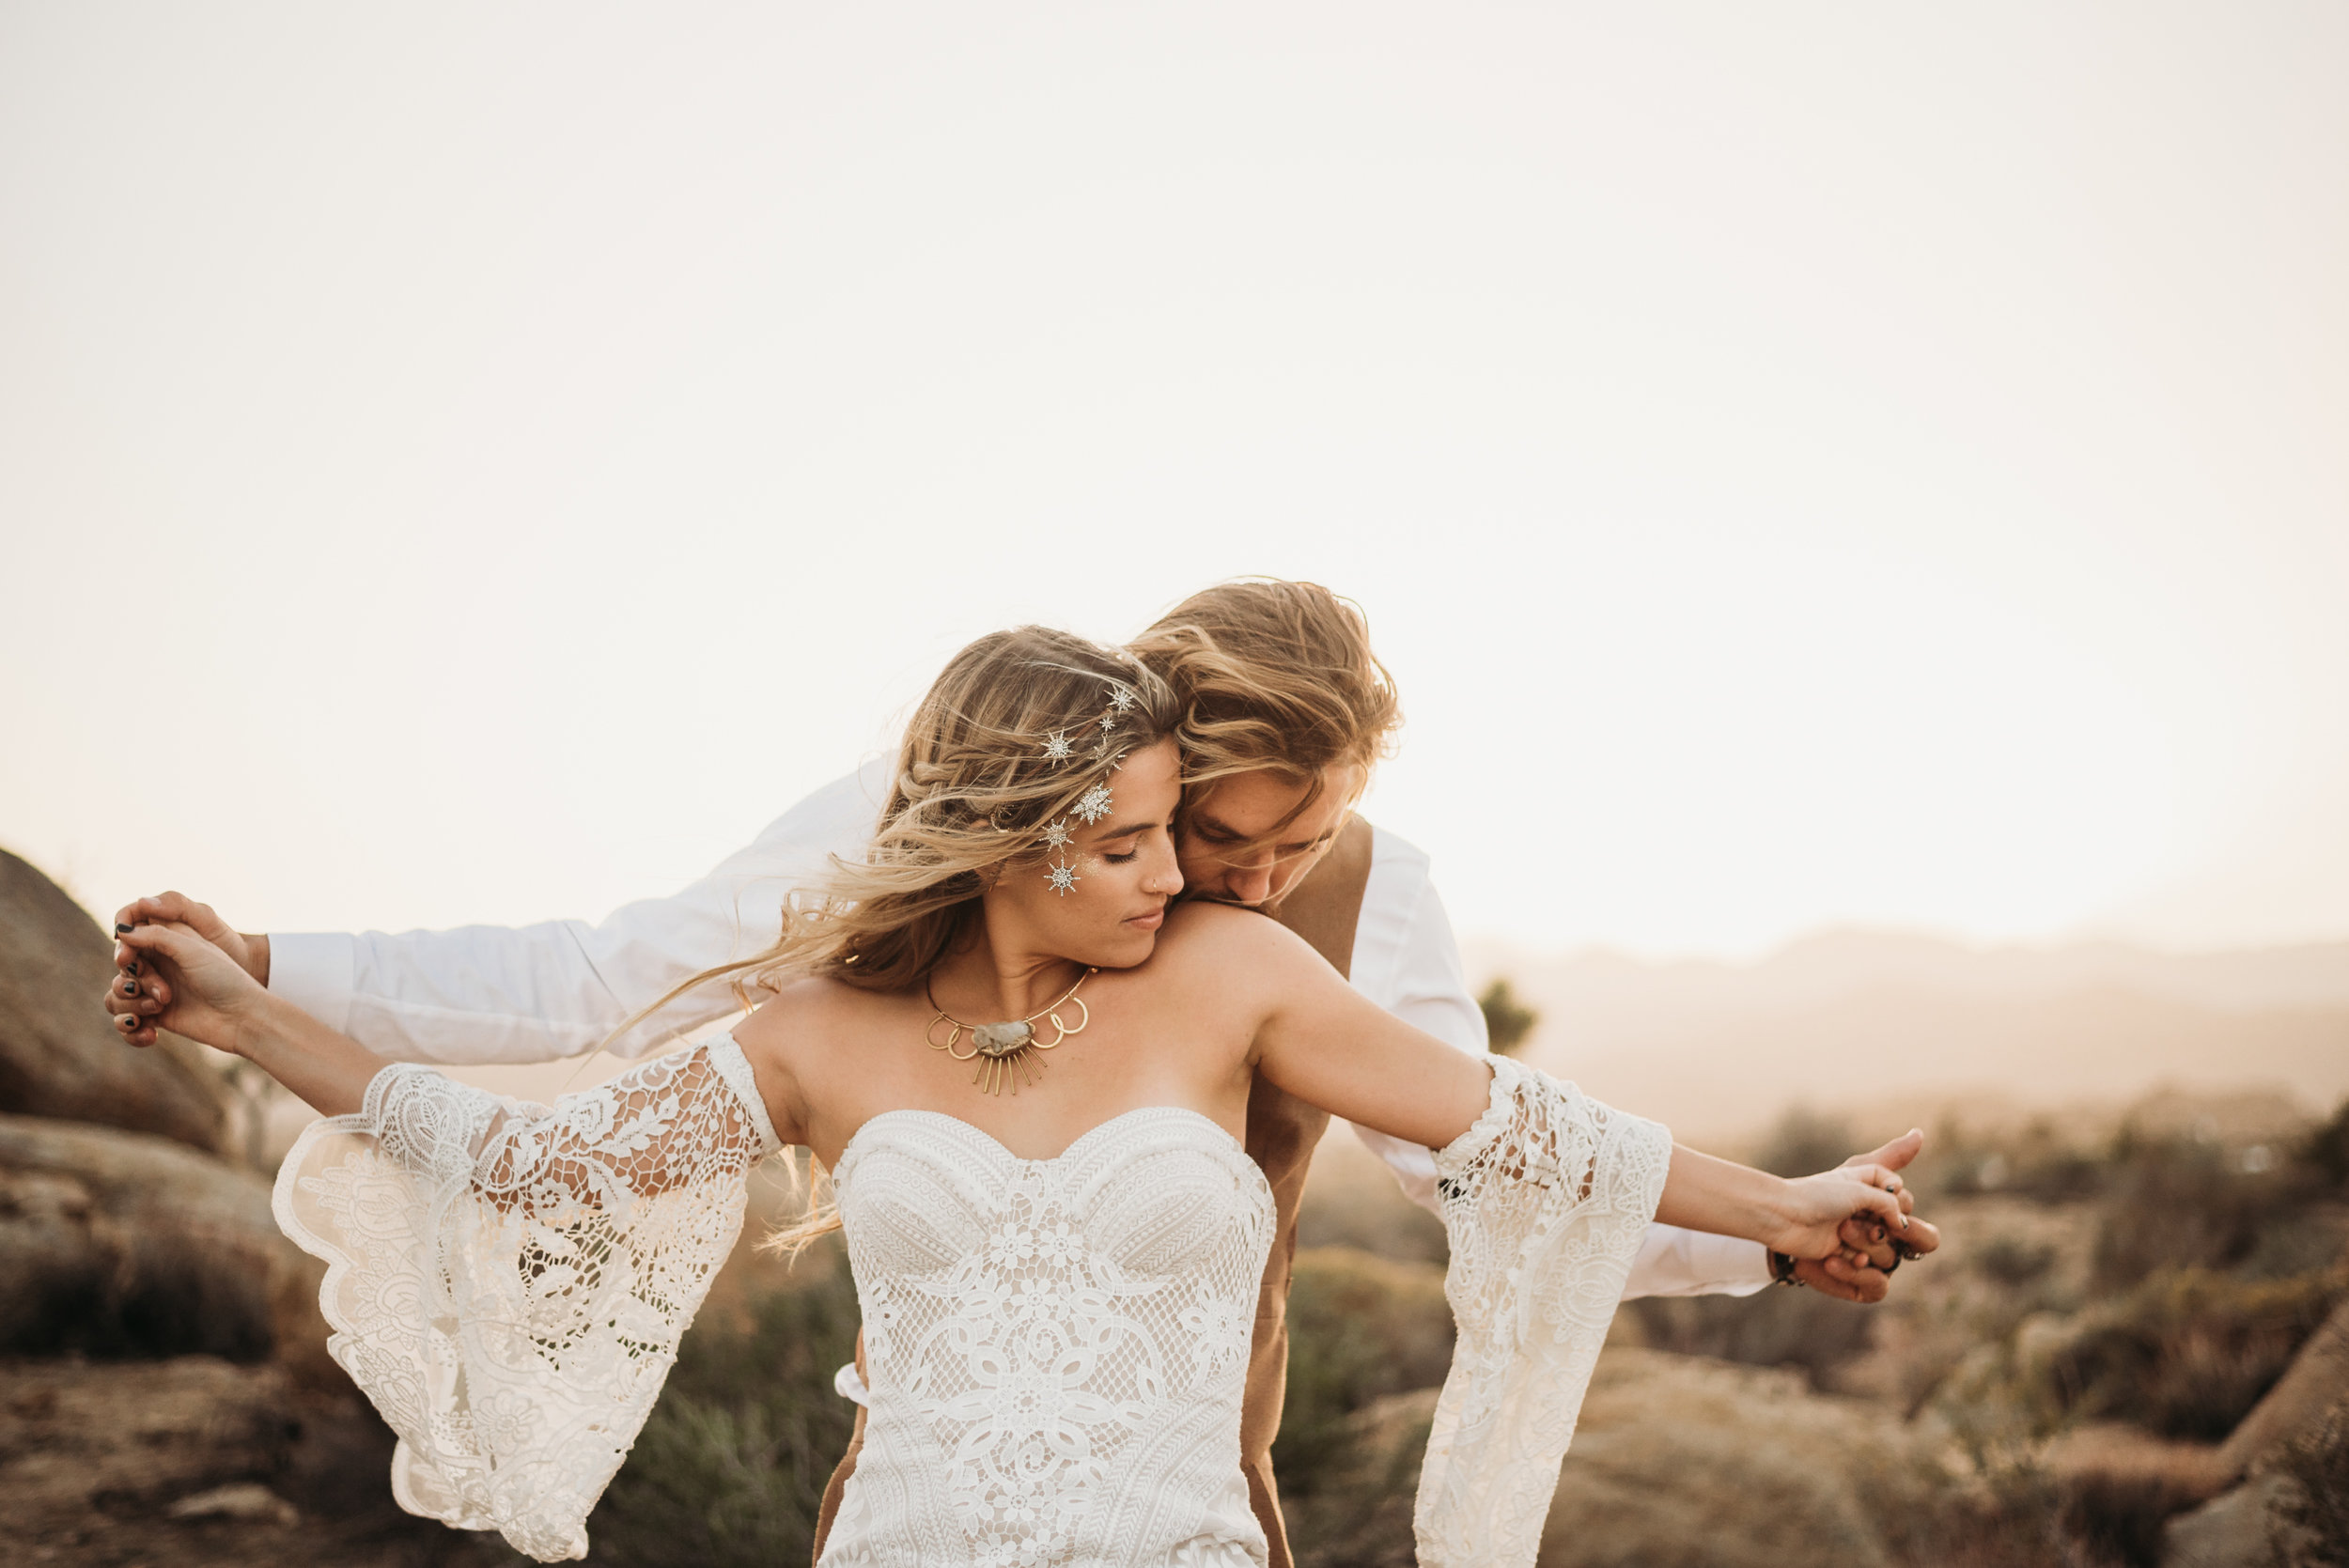 FortSt.John_photographer_TyraEPhotography_Wedding_Couple_Family_Photograhy_DawsonCreek_Elopement_Bride_Boduoir_Portraits-8633.jpg